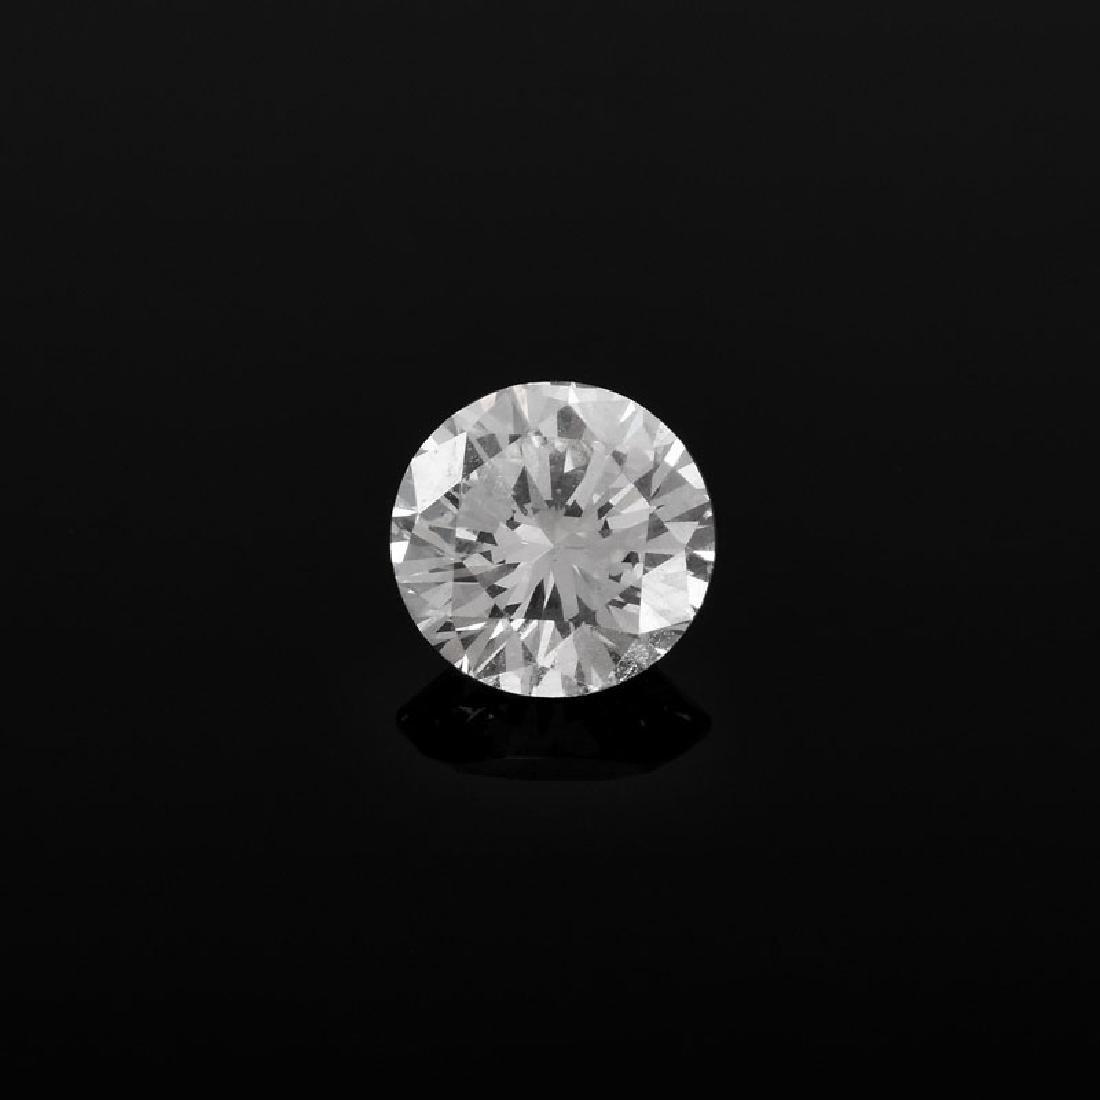 GIA Certified 1.01 Carat Round Brilliant Cut Diamond, H